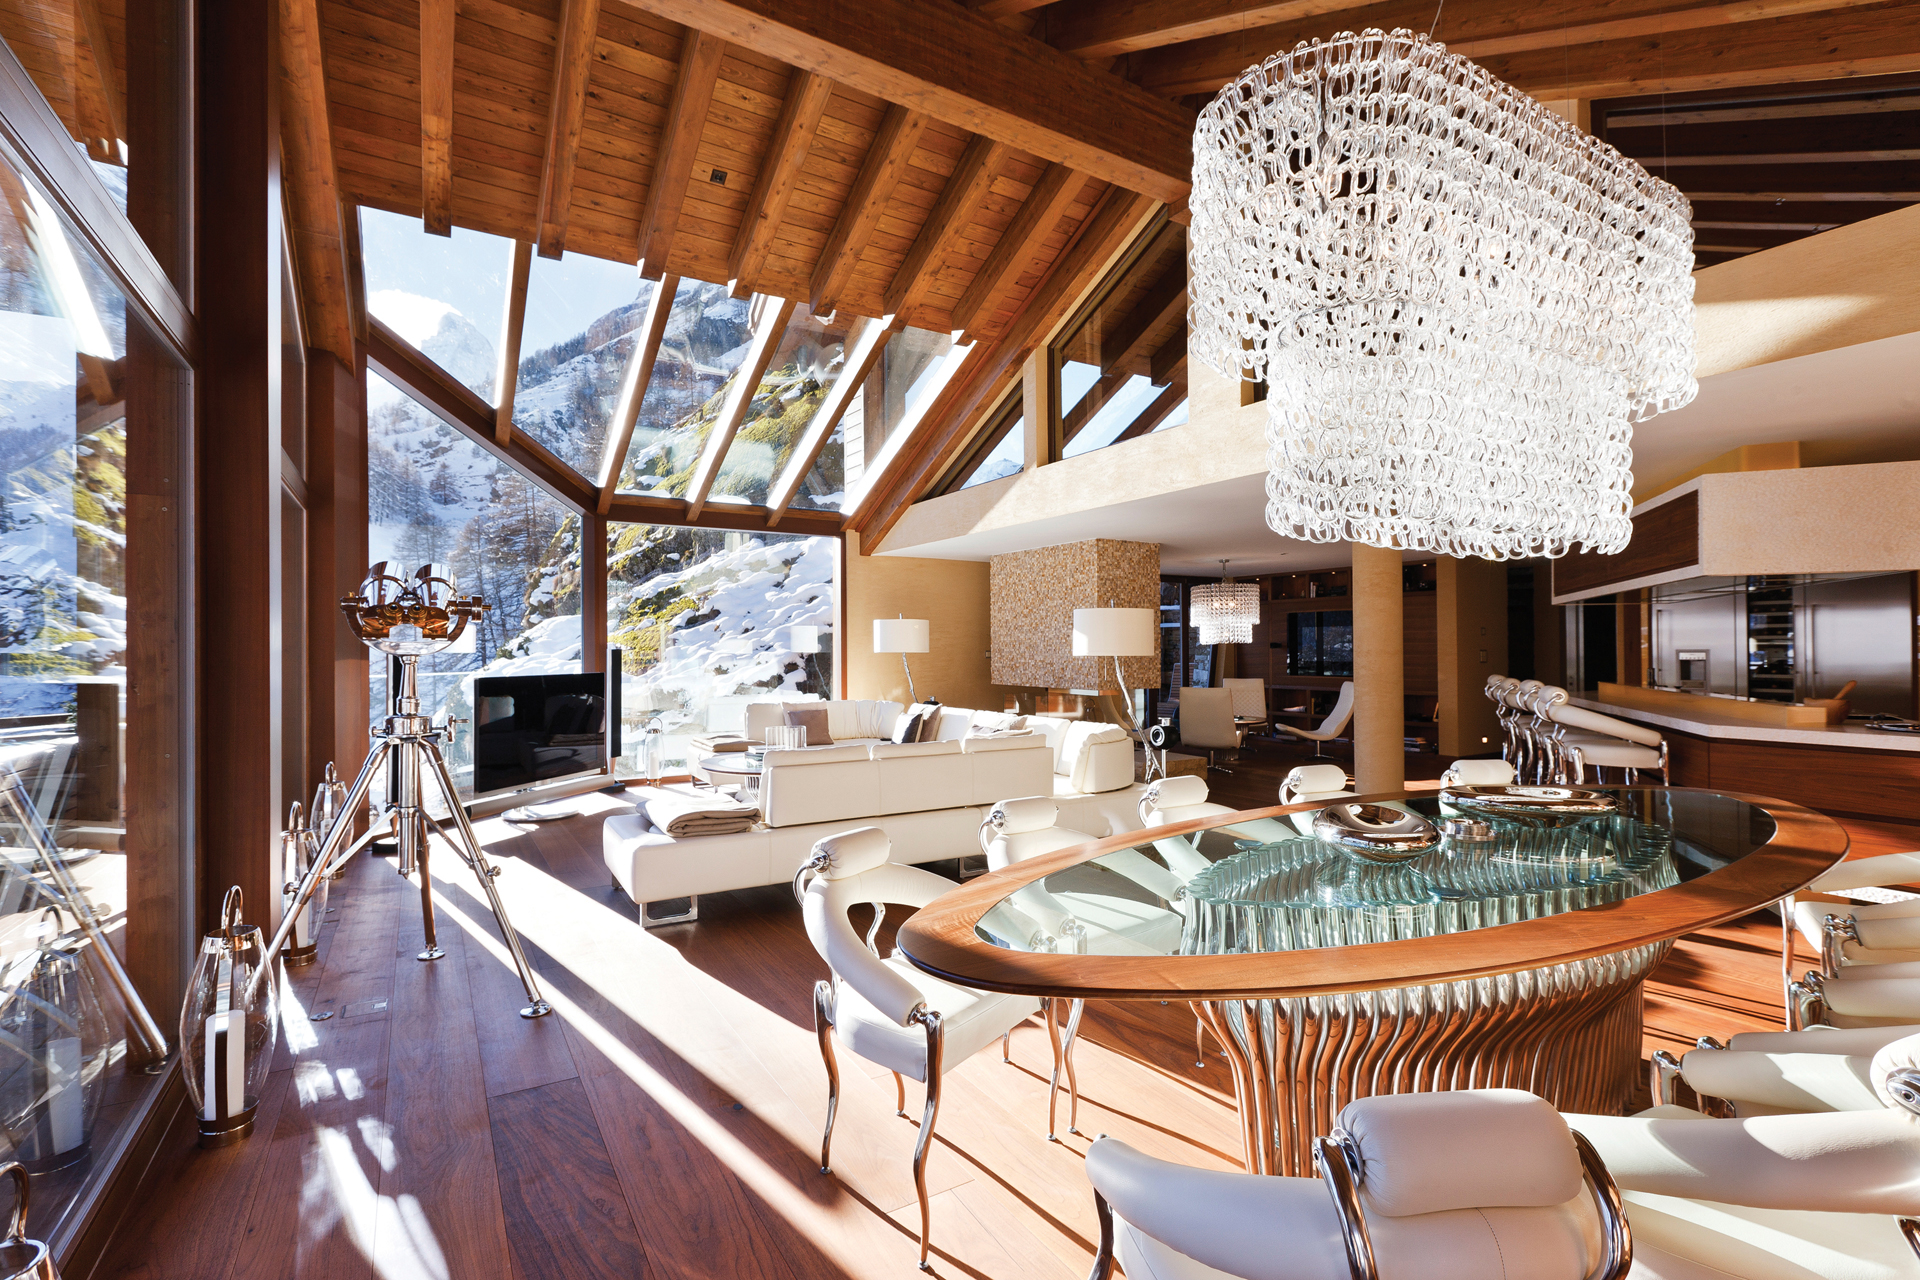 Luxury Ski Chalet Zermatt Peak, Zermatt, Swiss Alps